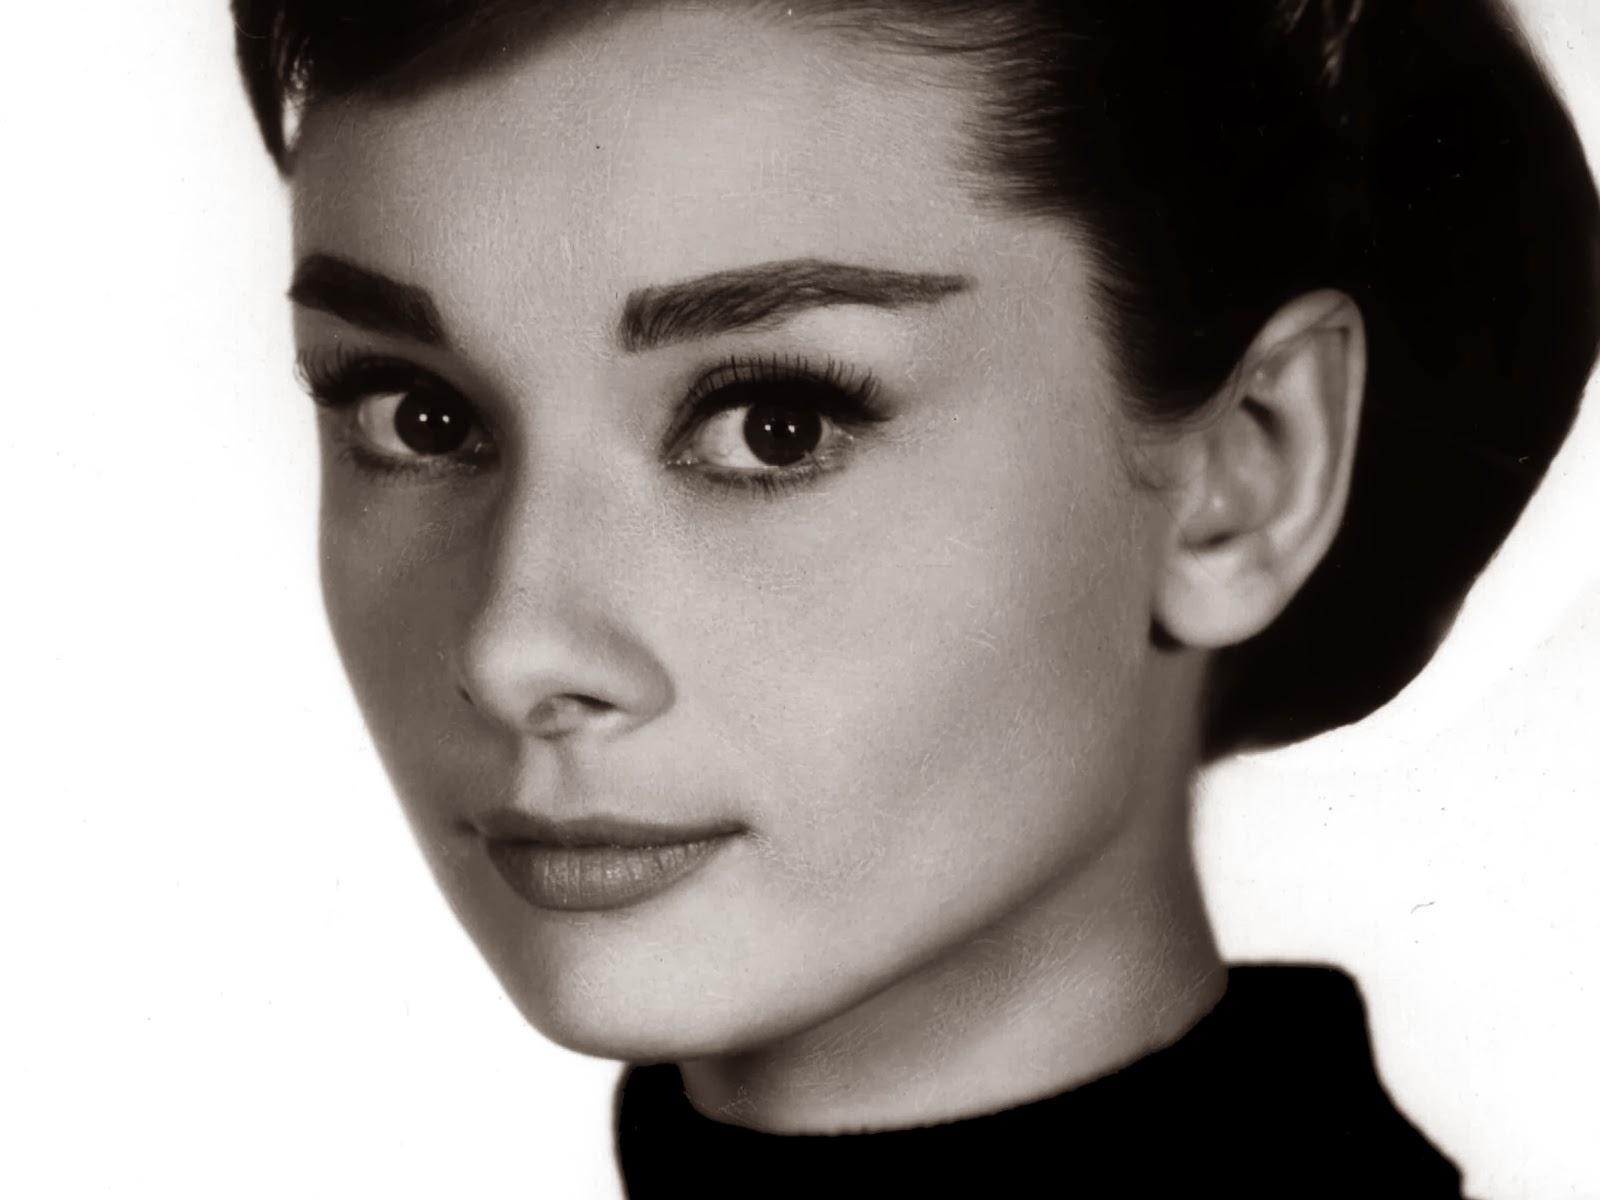 Dharia's Closet: Audrey Hepburn inspired makeup